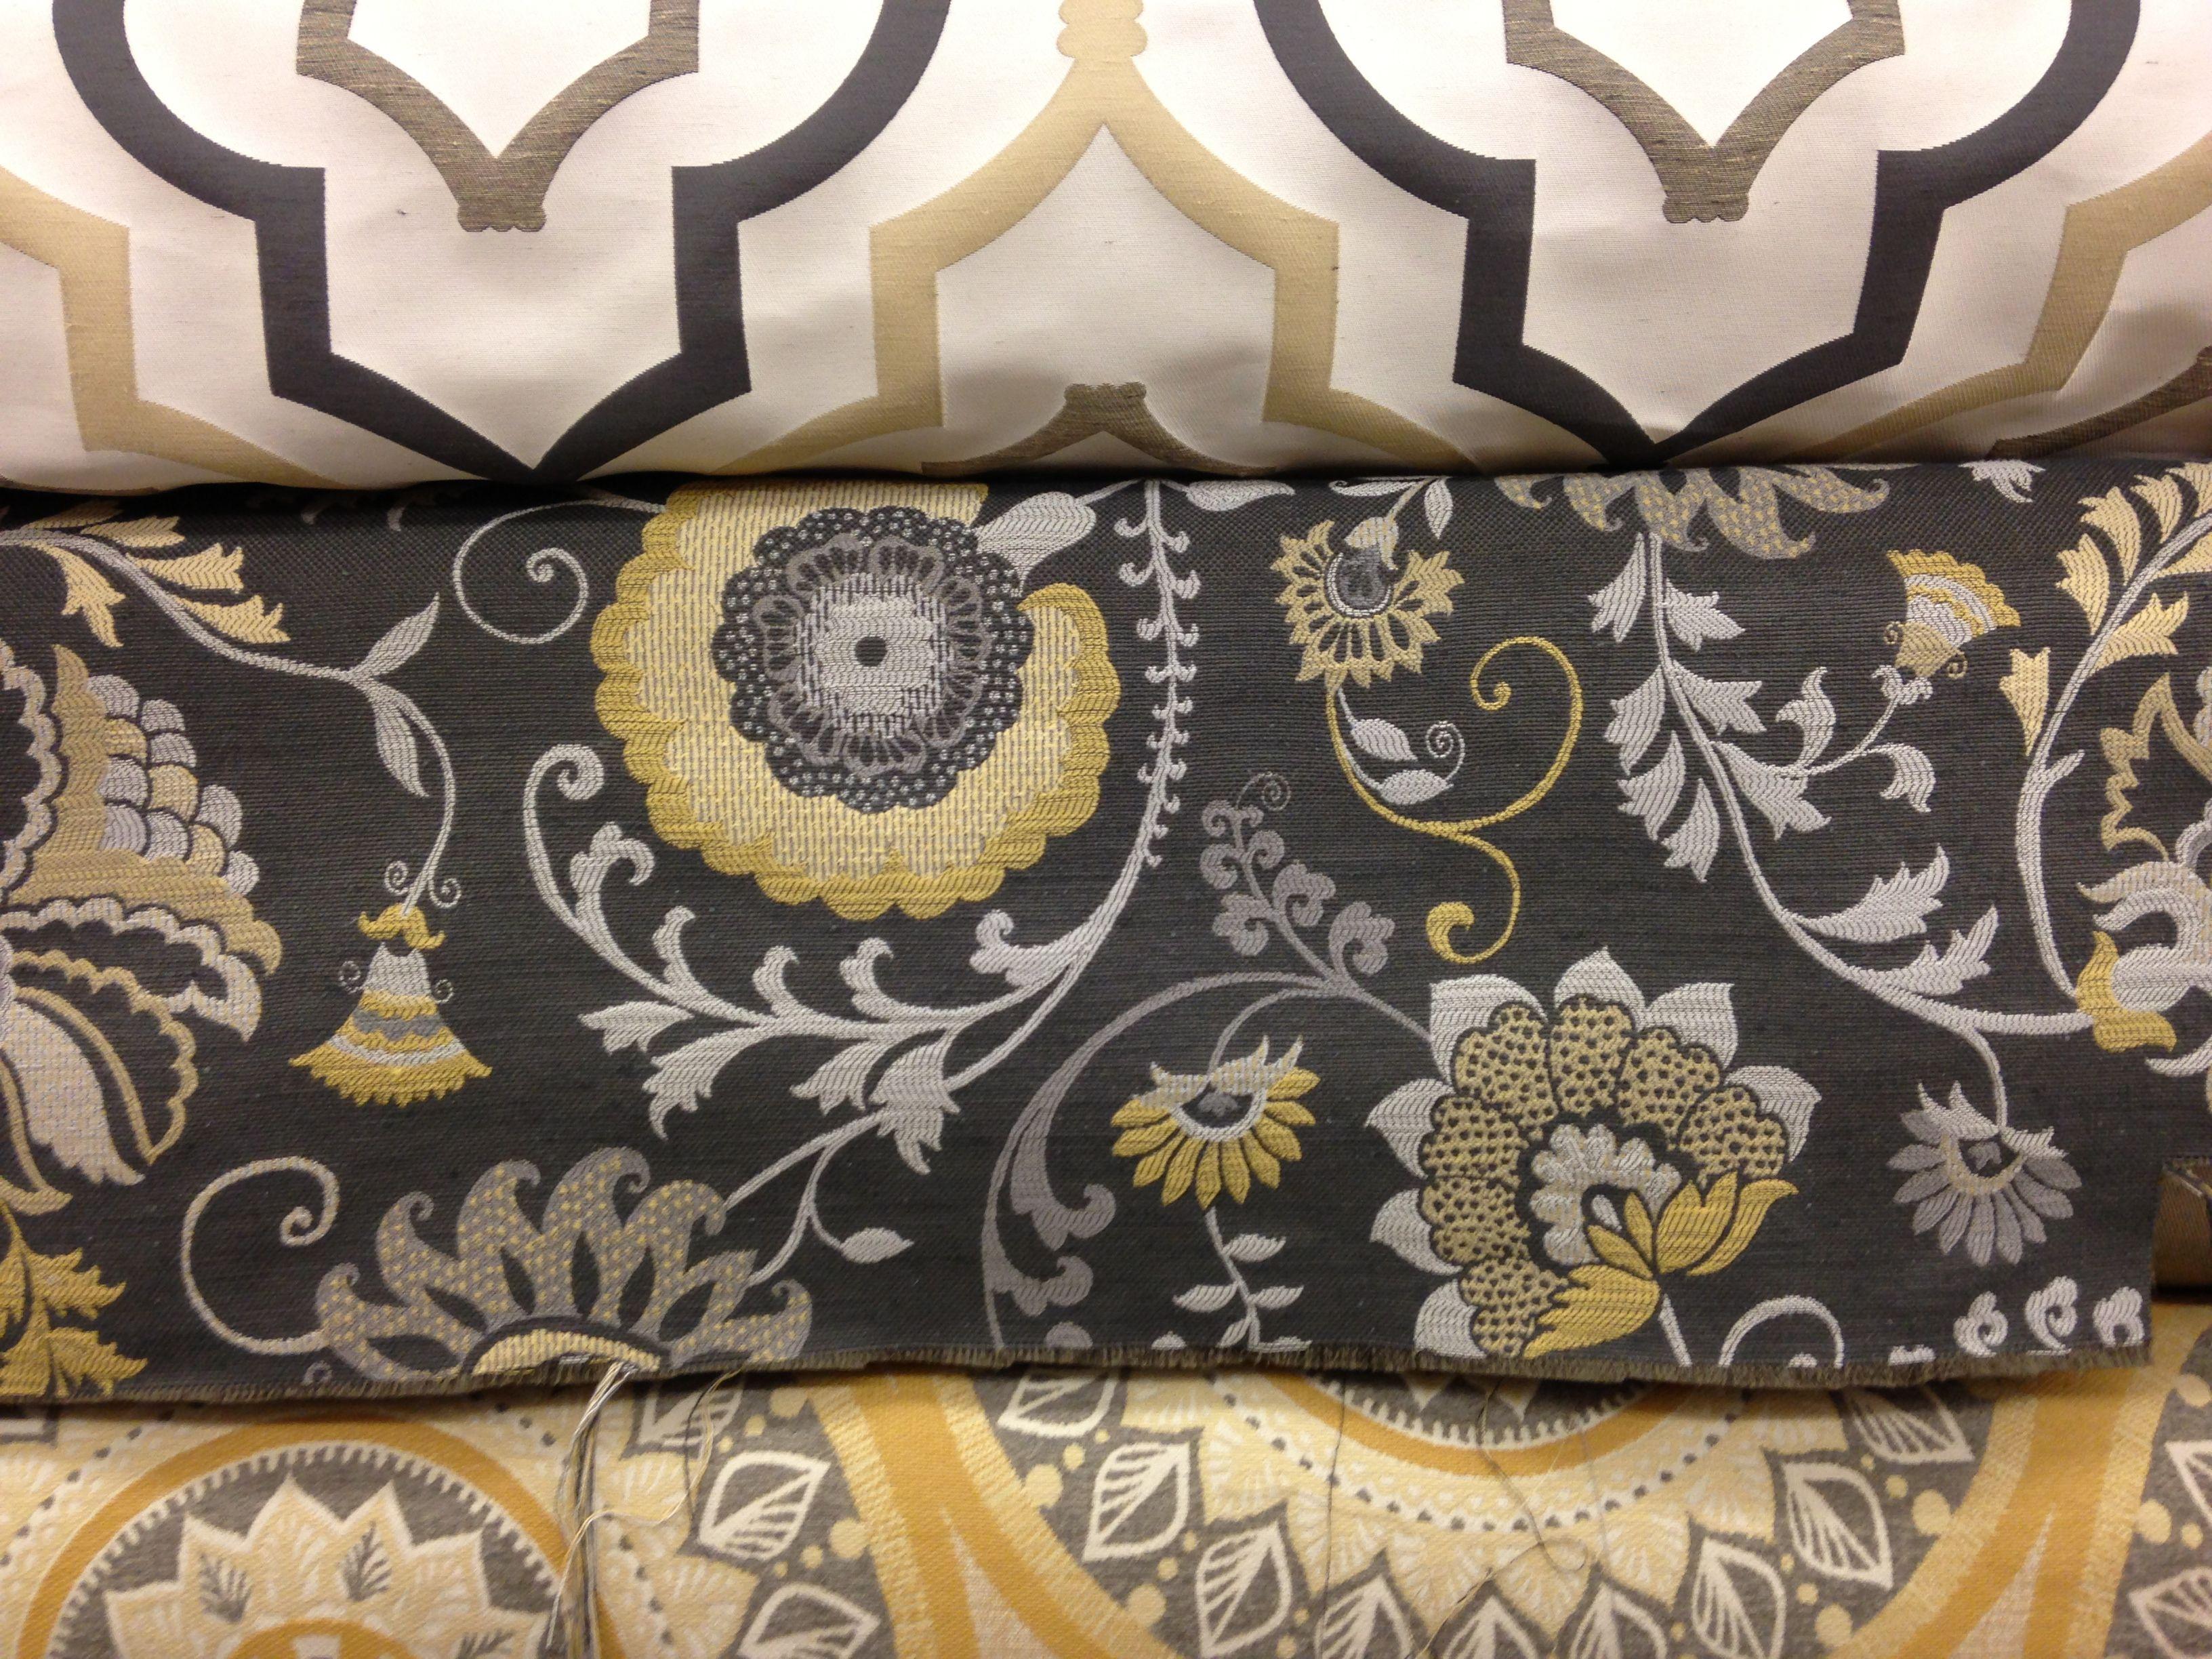 Fabric From Hobby Lobby I Like For Recovering My Glider Rocker Upholstery Aisle Glider Rocker Entry Decor Upholstery